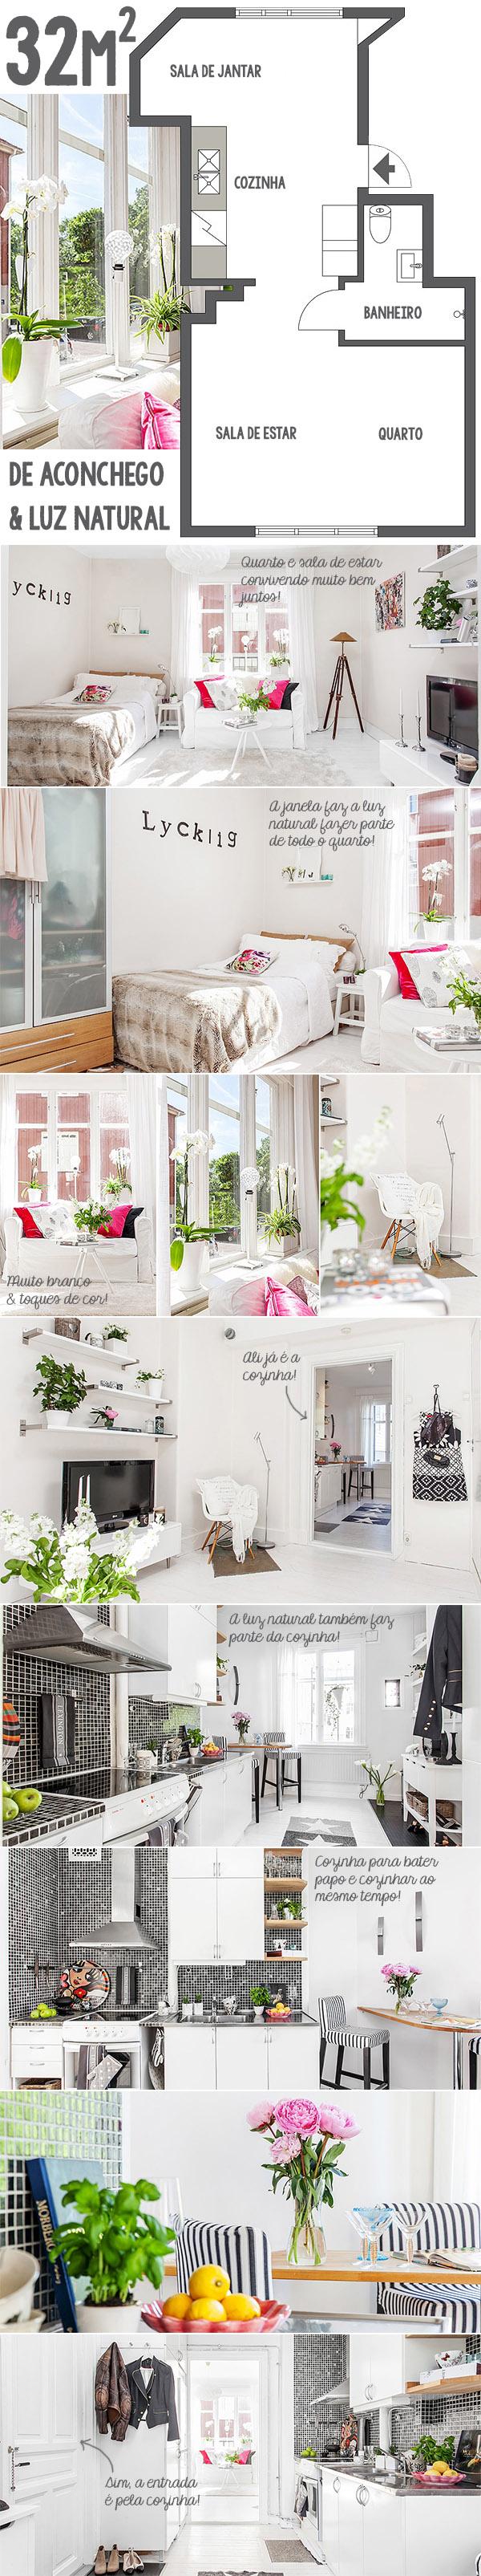 AP 32m | Studio apartment, Luxury definition, New homes